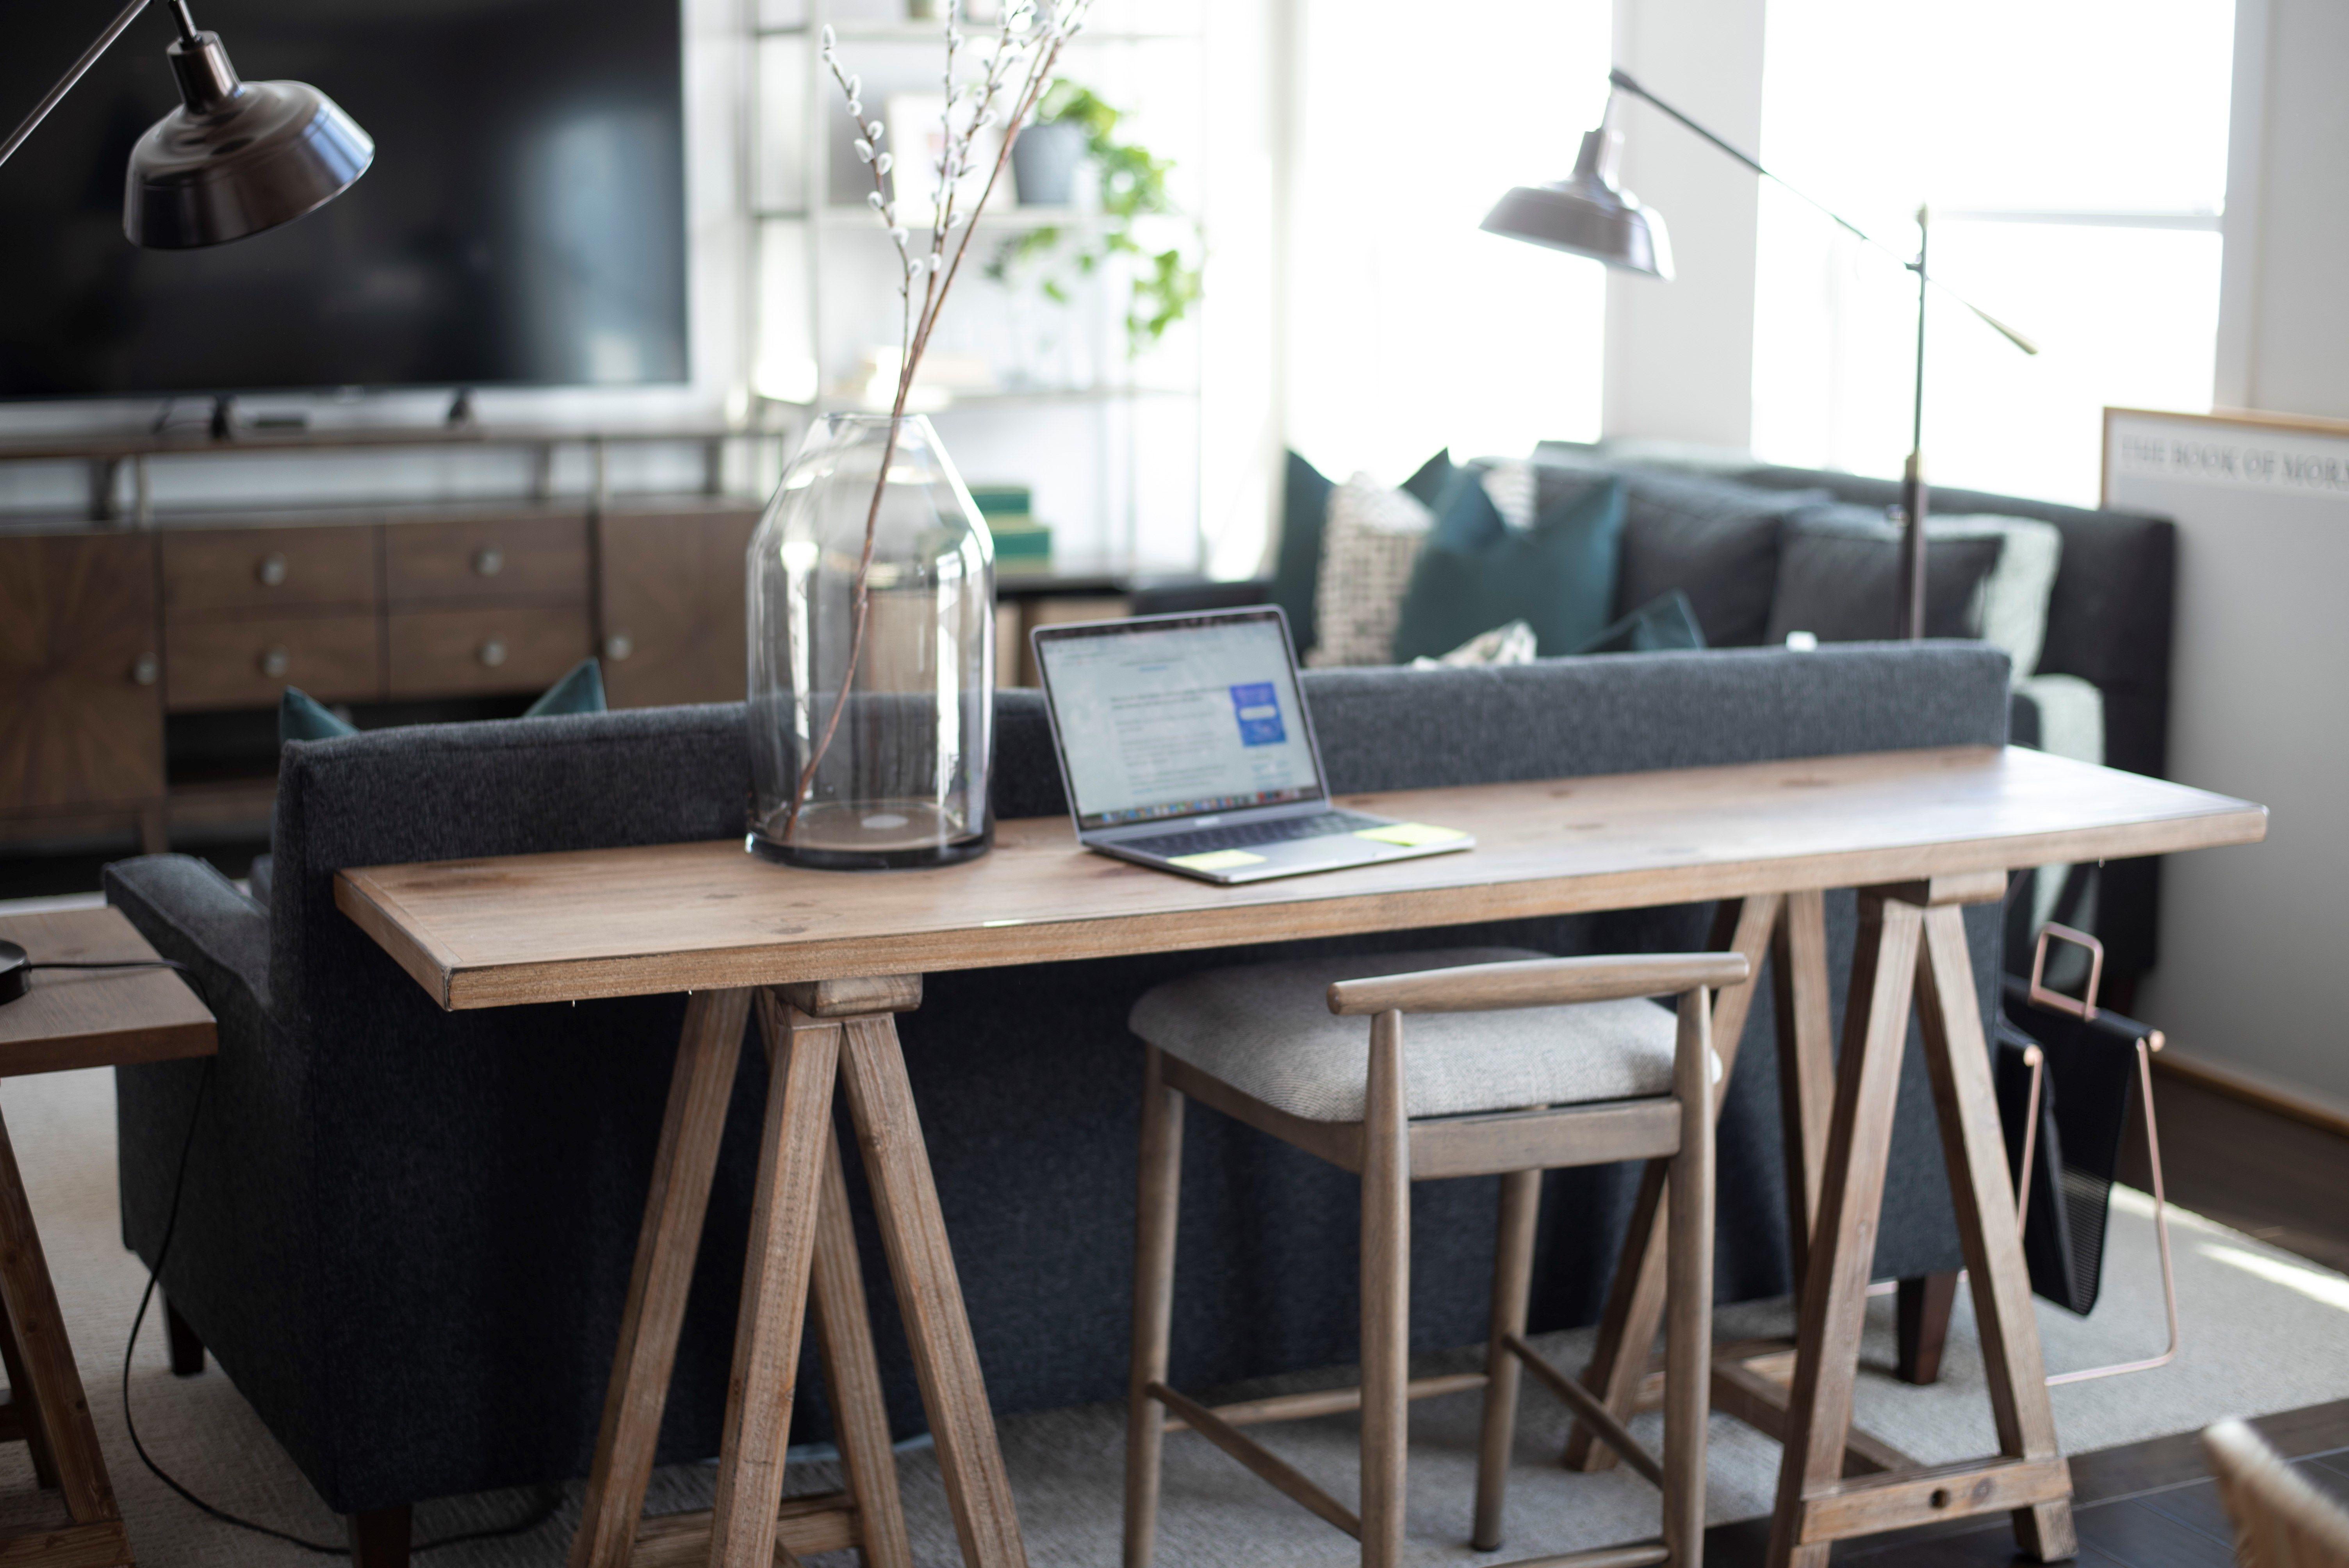 Fisher Home Furnishings Home Furnishings Furniture Companies